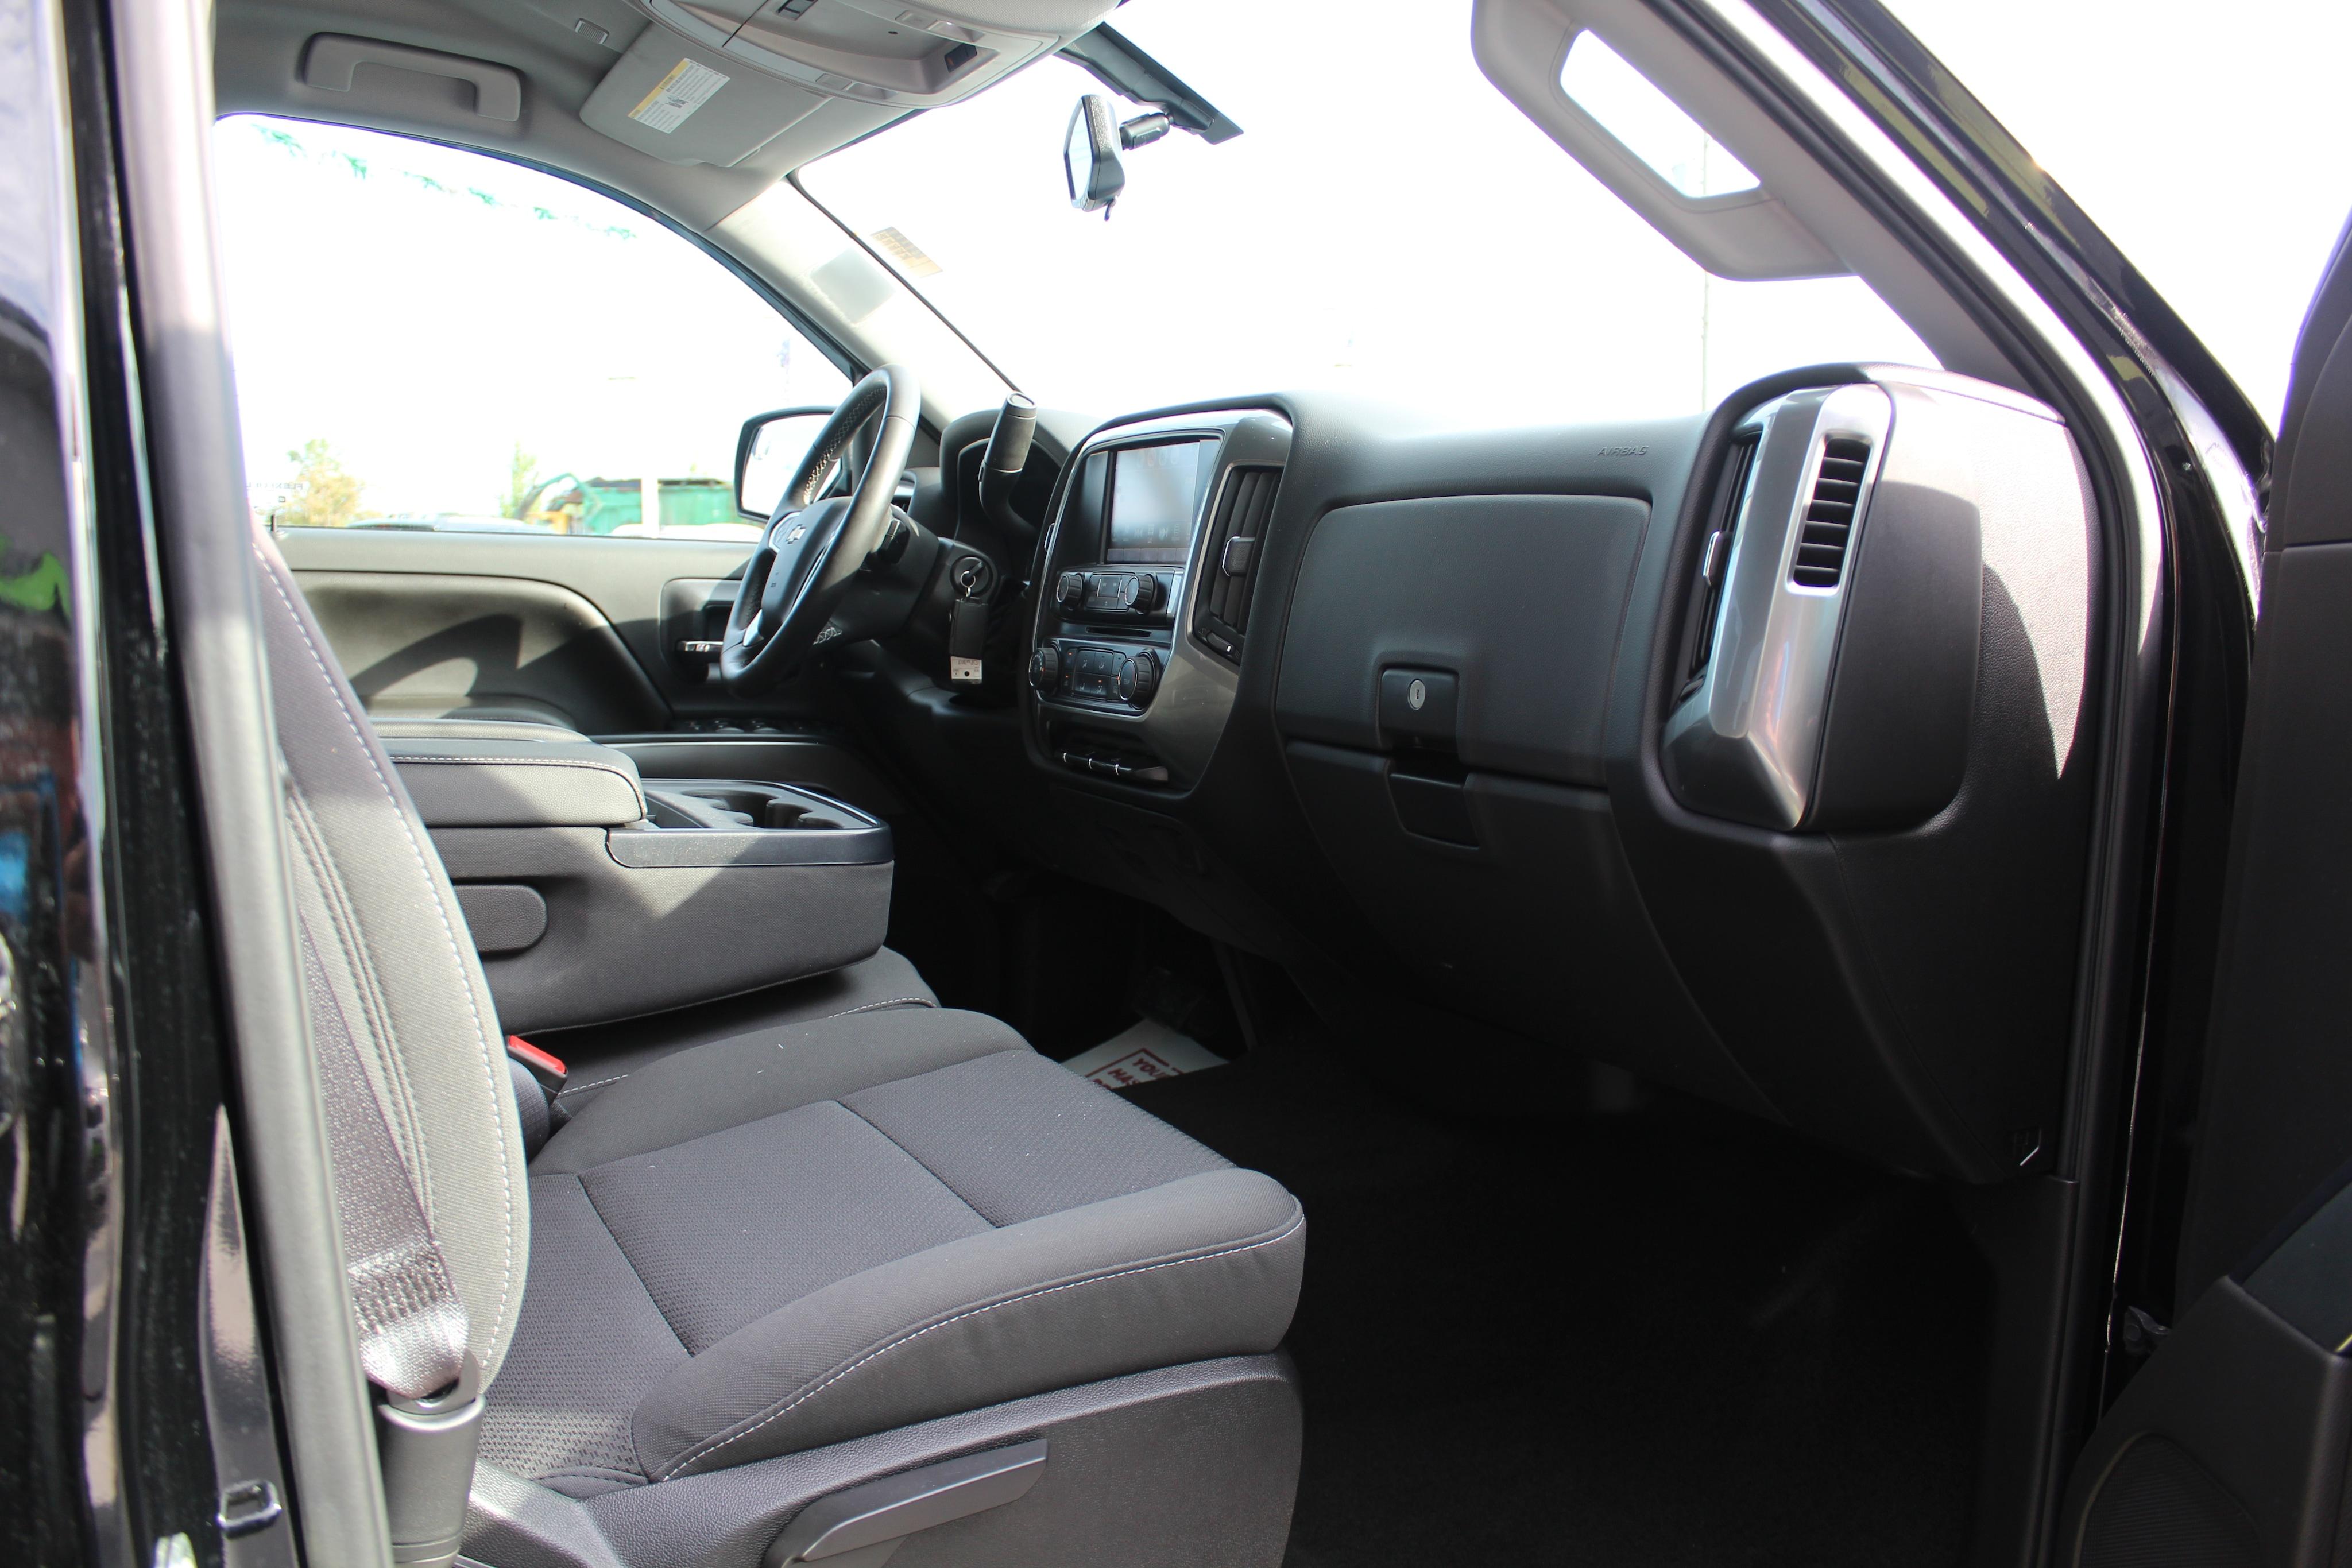 2017 Chevrolet Silverado 1500 Extended Cab Pickup